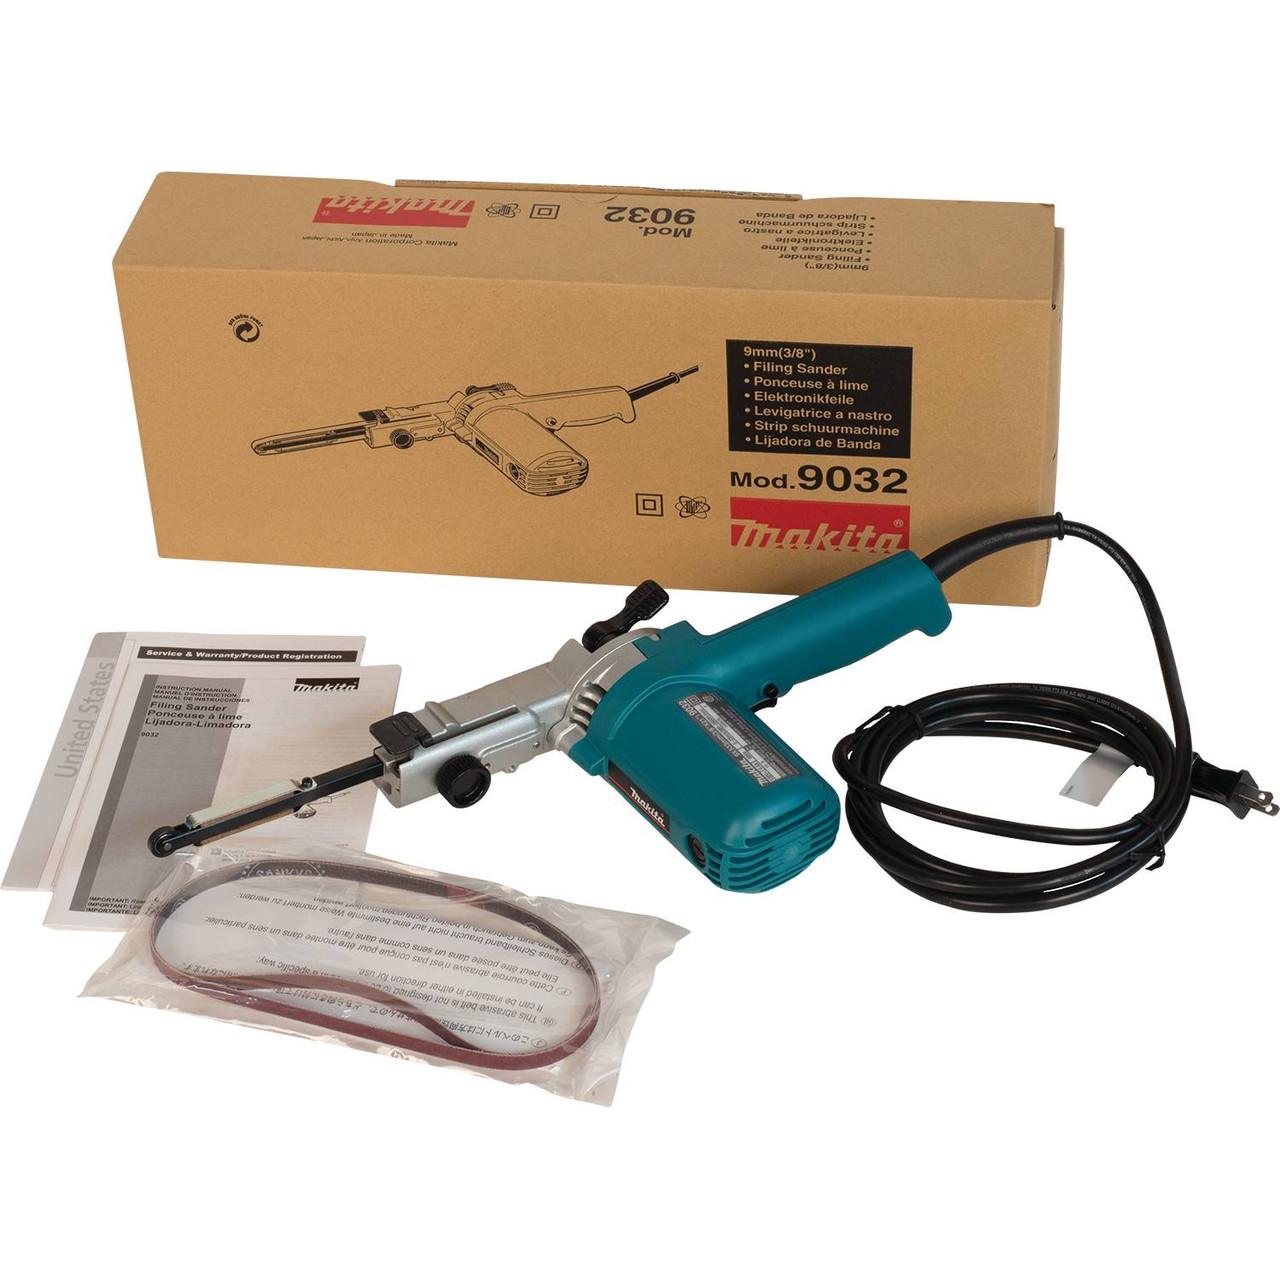 Pack of 100 Grade CFP44 1.5-3.5 Micron Slow Flow 7cm Diameter Thomas CFP44-070 Cellulose Quantitative Filter Paper